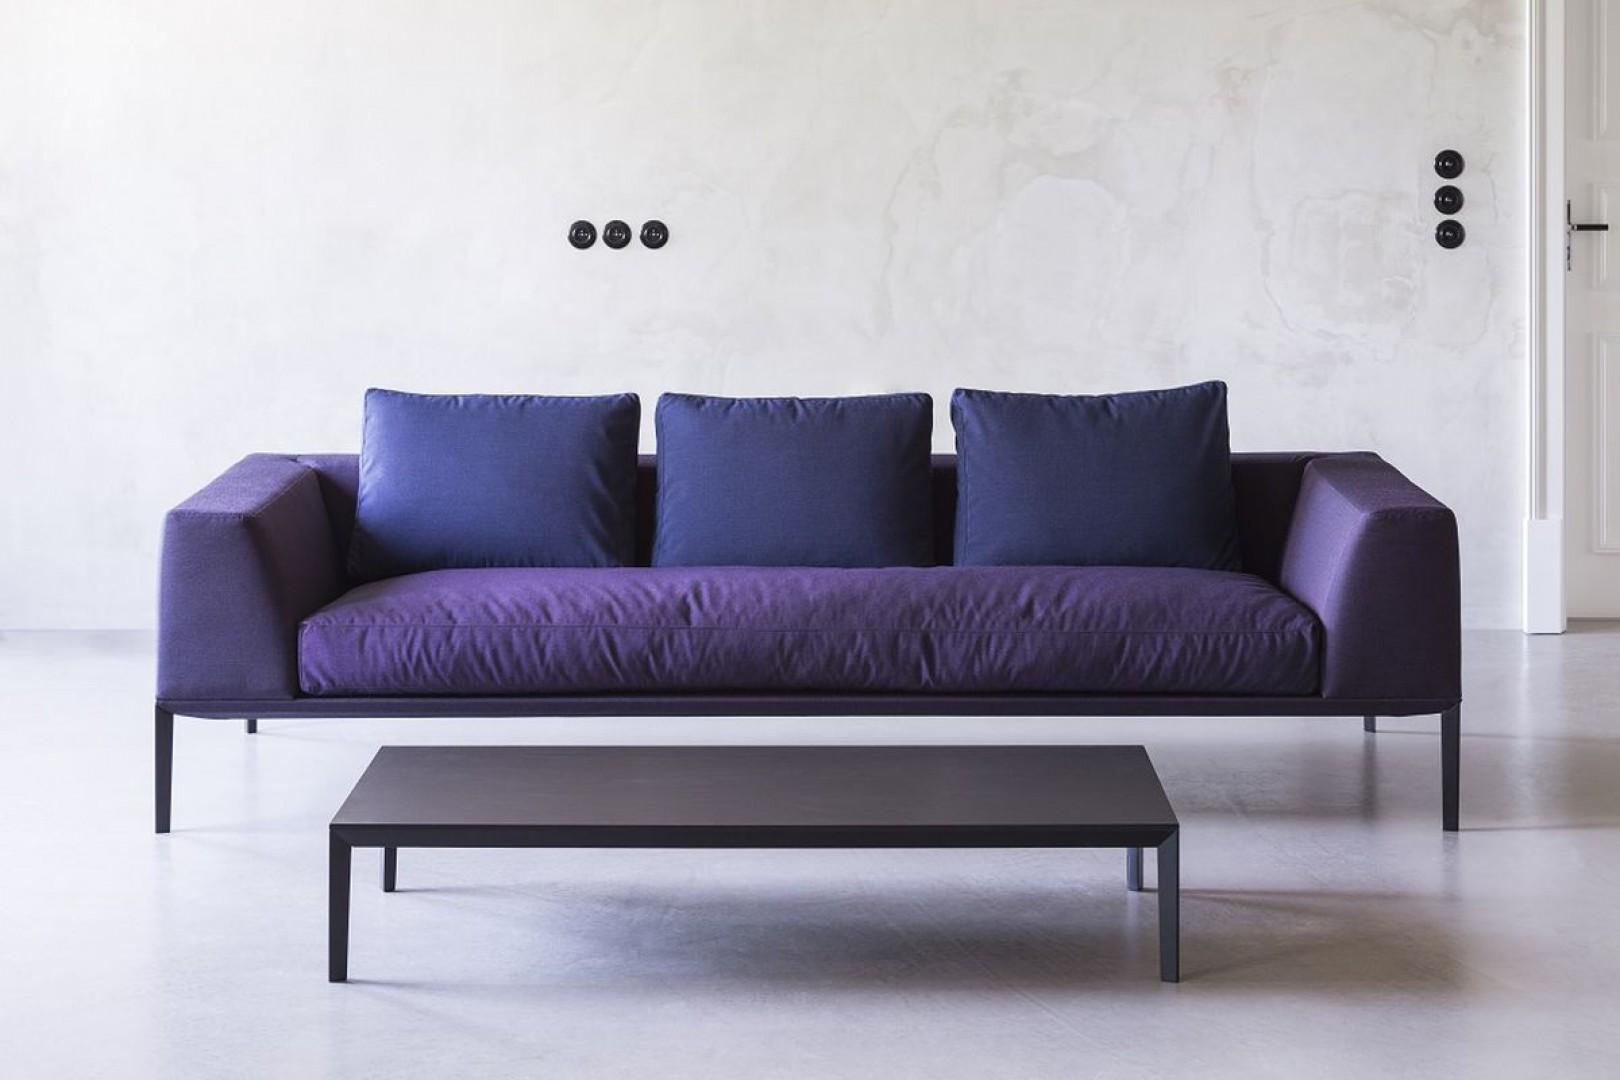 Sofa Sosa, projekt: Piotr Kuchciński dla Noti. Fot. Noti